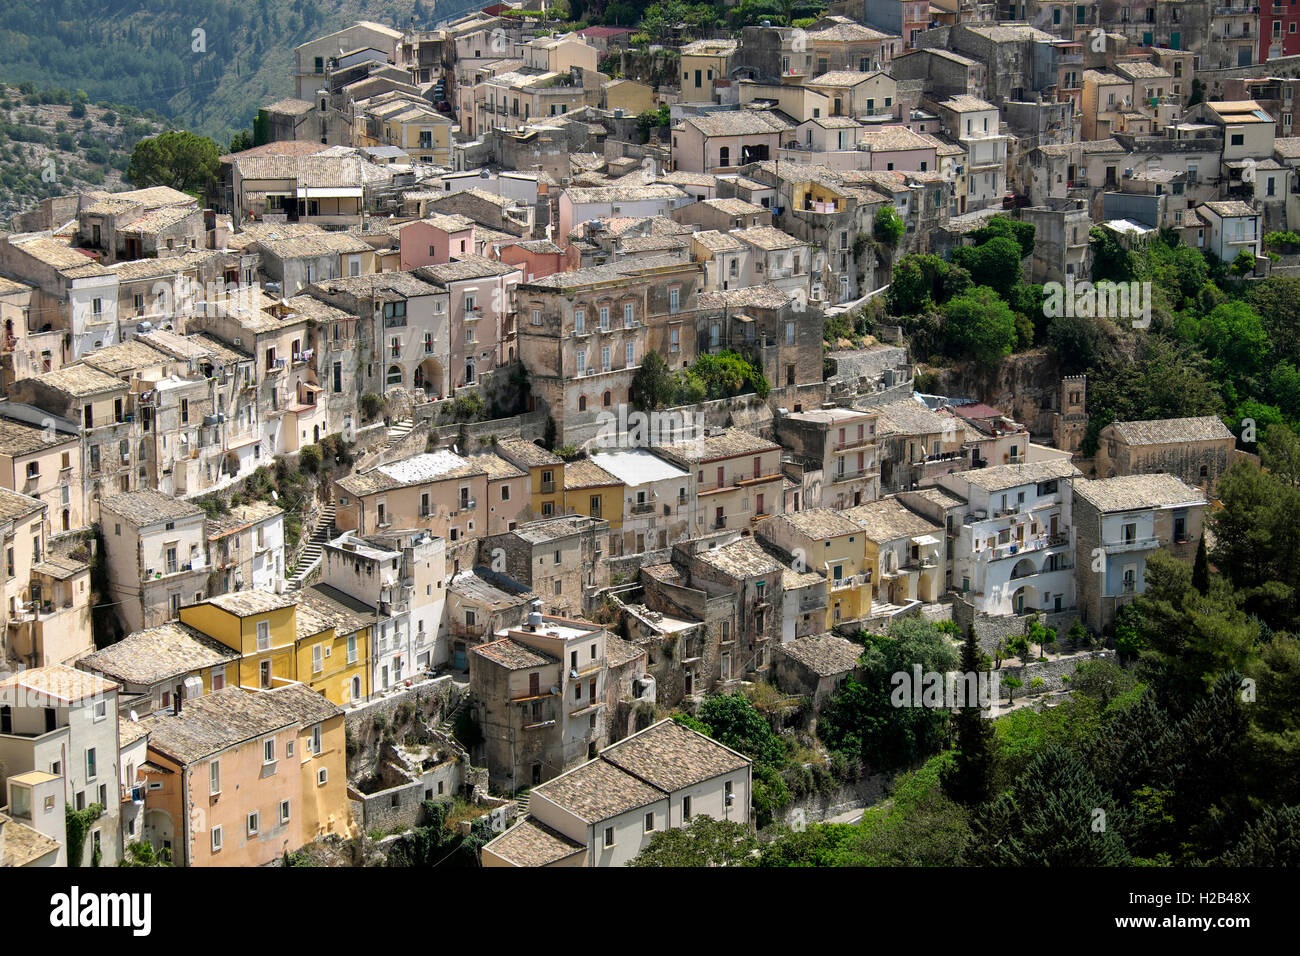 The historic centre of Ragusa Ibla, Sicily, Italy - Stock Image